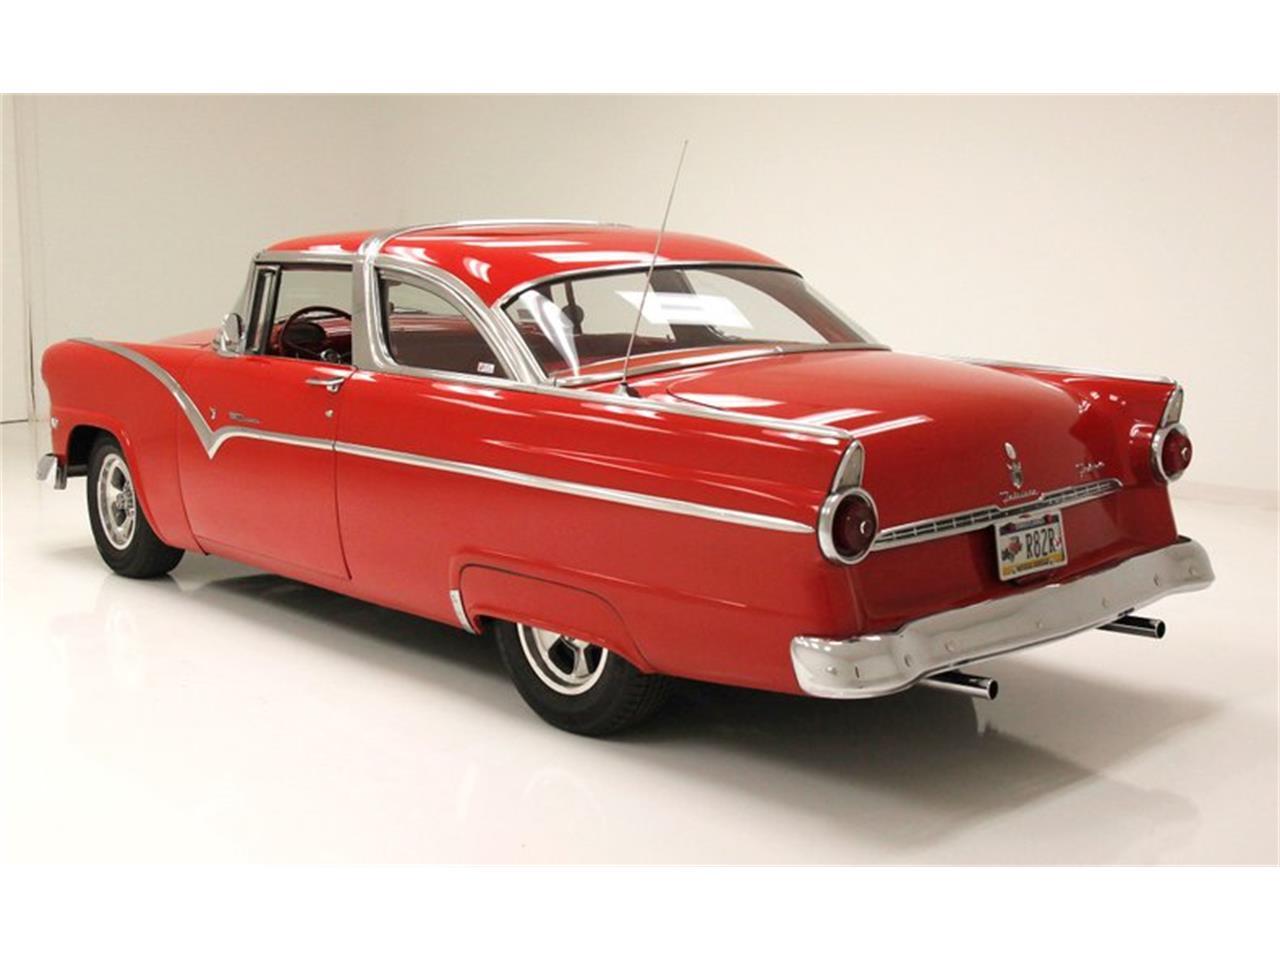 1955 Ford Fairlane (CC-1373777) for sale in Morgantown, Pennsylvania